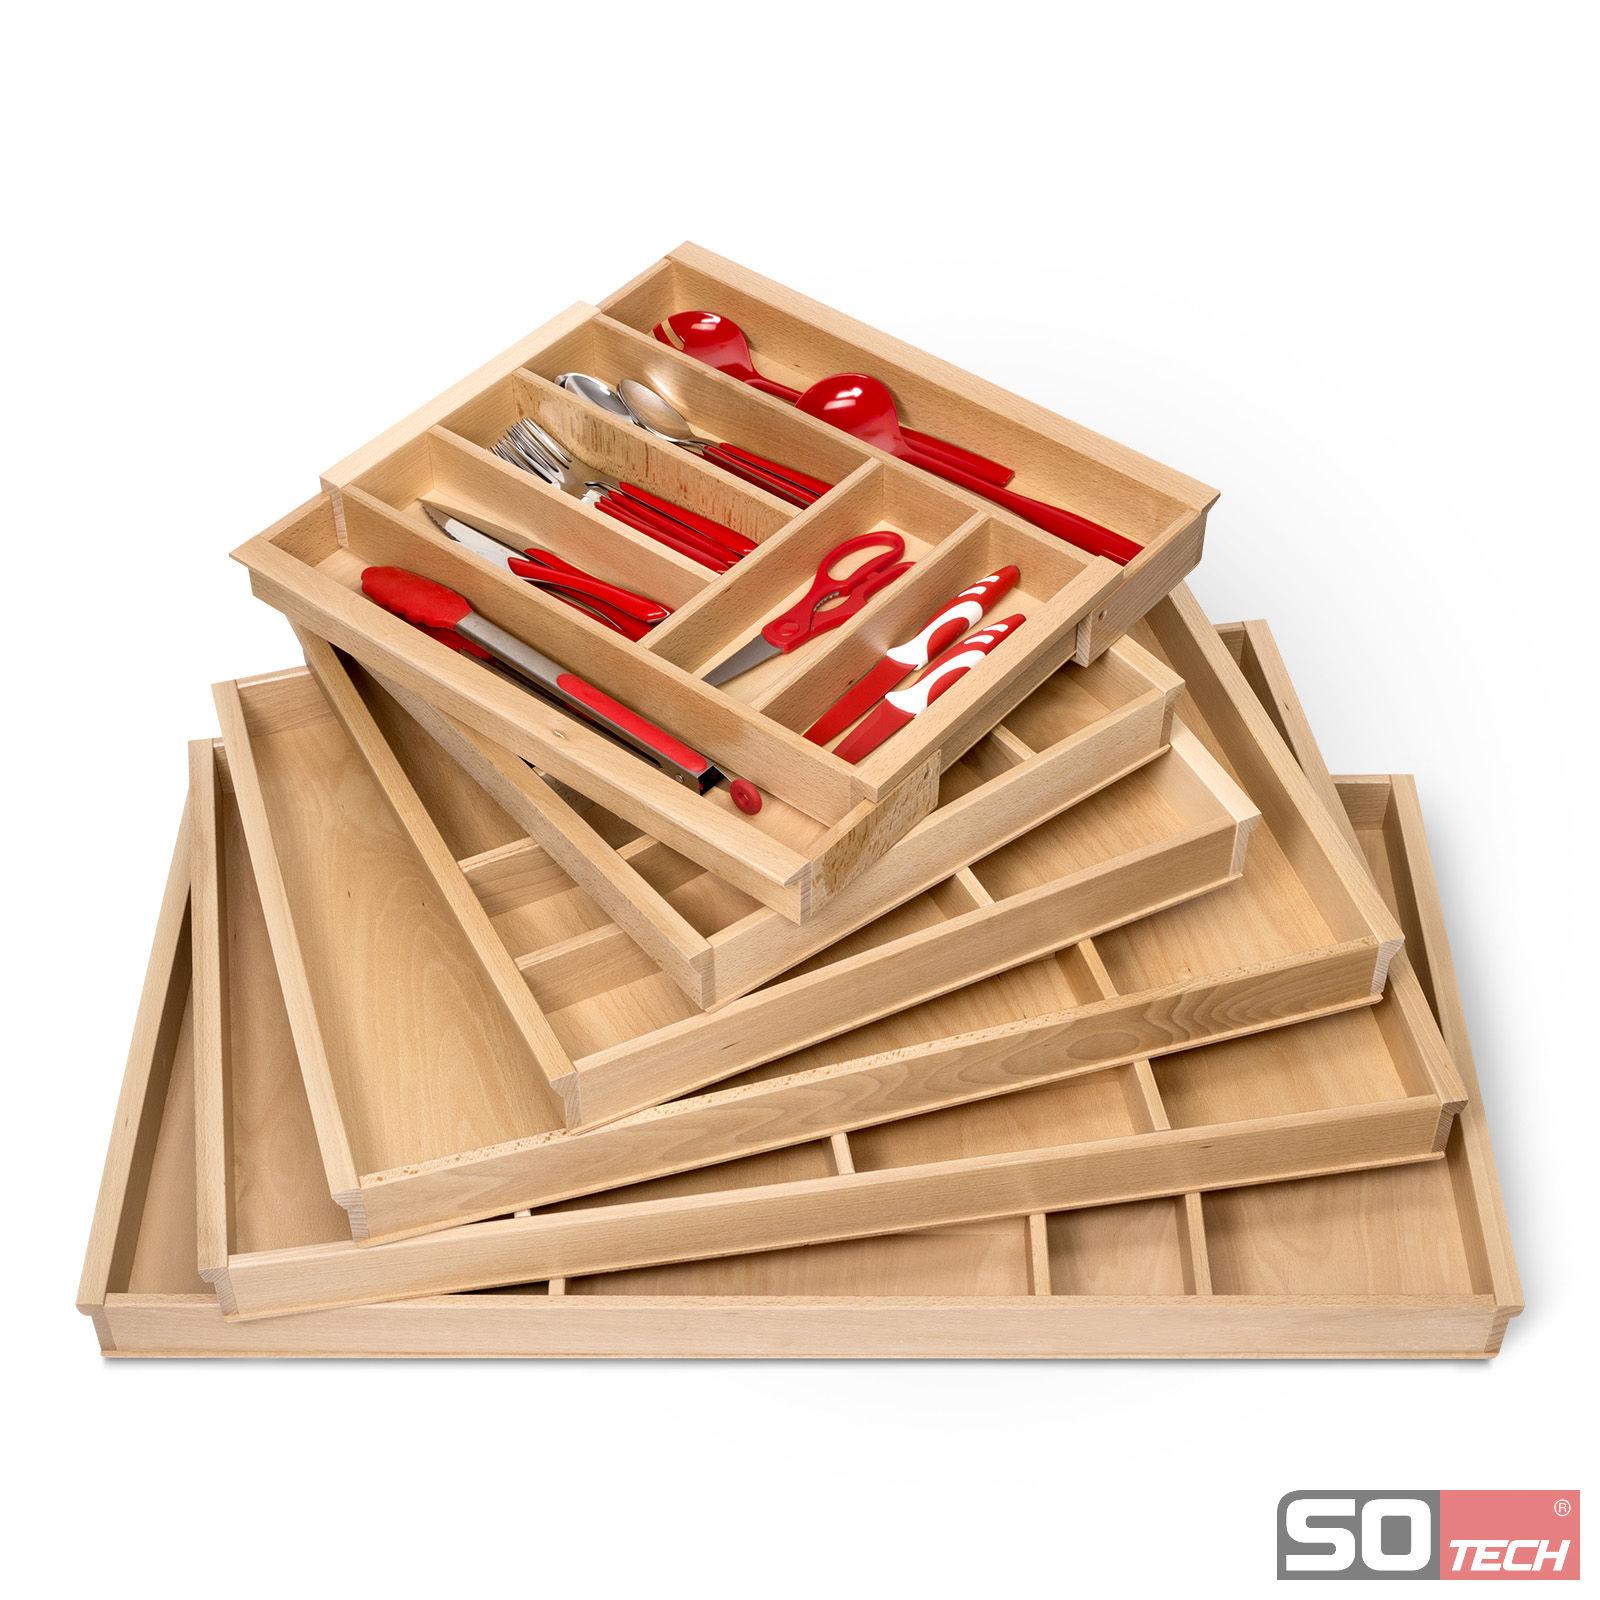 orga box iii besteckkasten 60 cm buchenholz schubladeneinsatz u a f r nobilia ebay. Black Bedroom Furniture Sets. Home Design Ideas